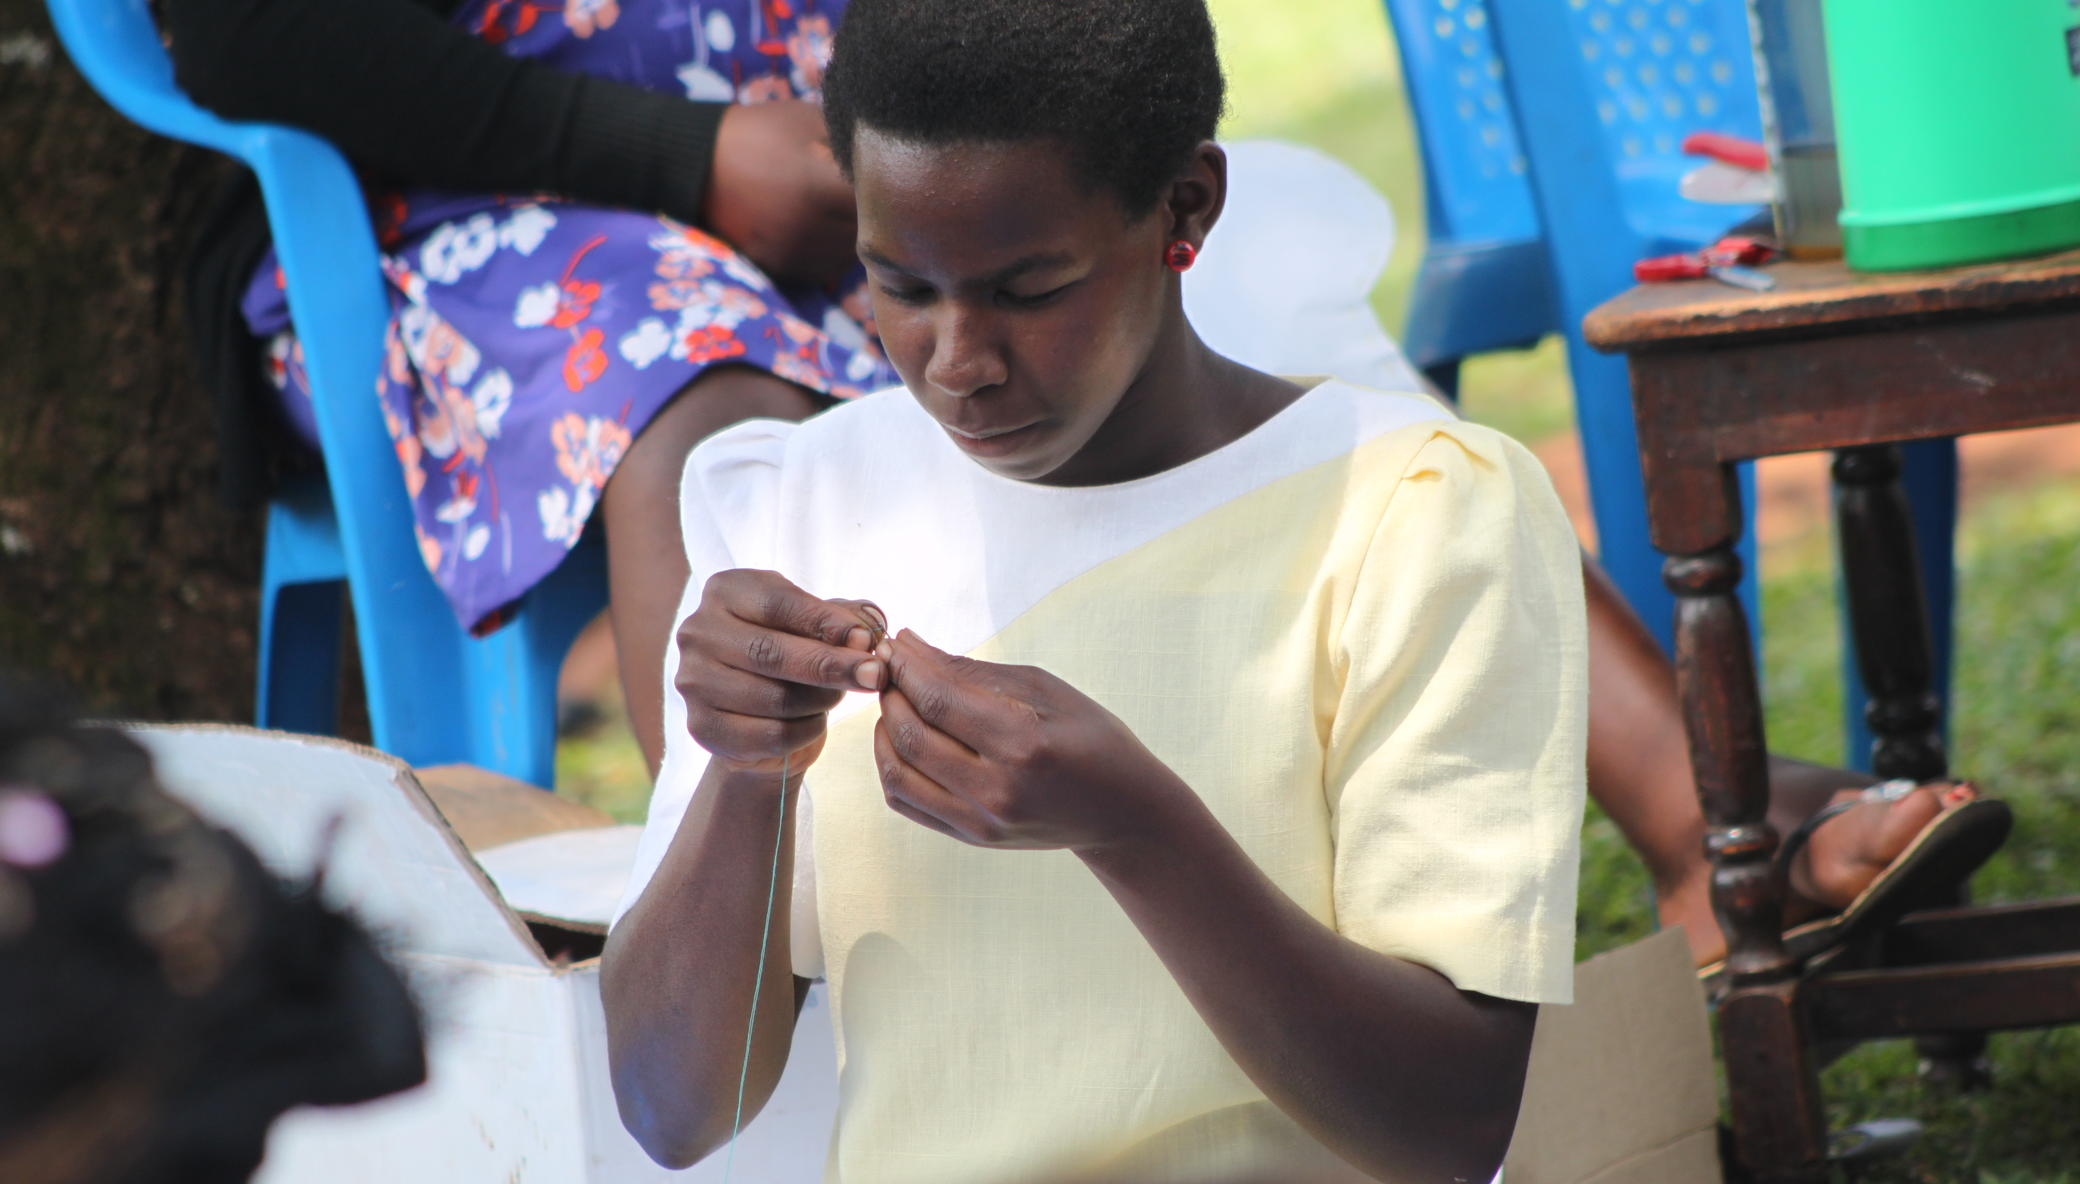 Sponsor 10 Children to go to school in Uganda